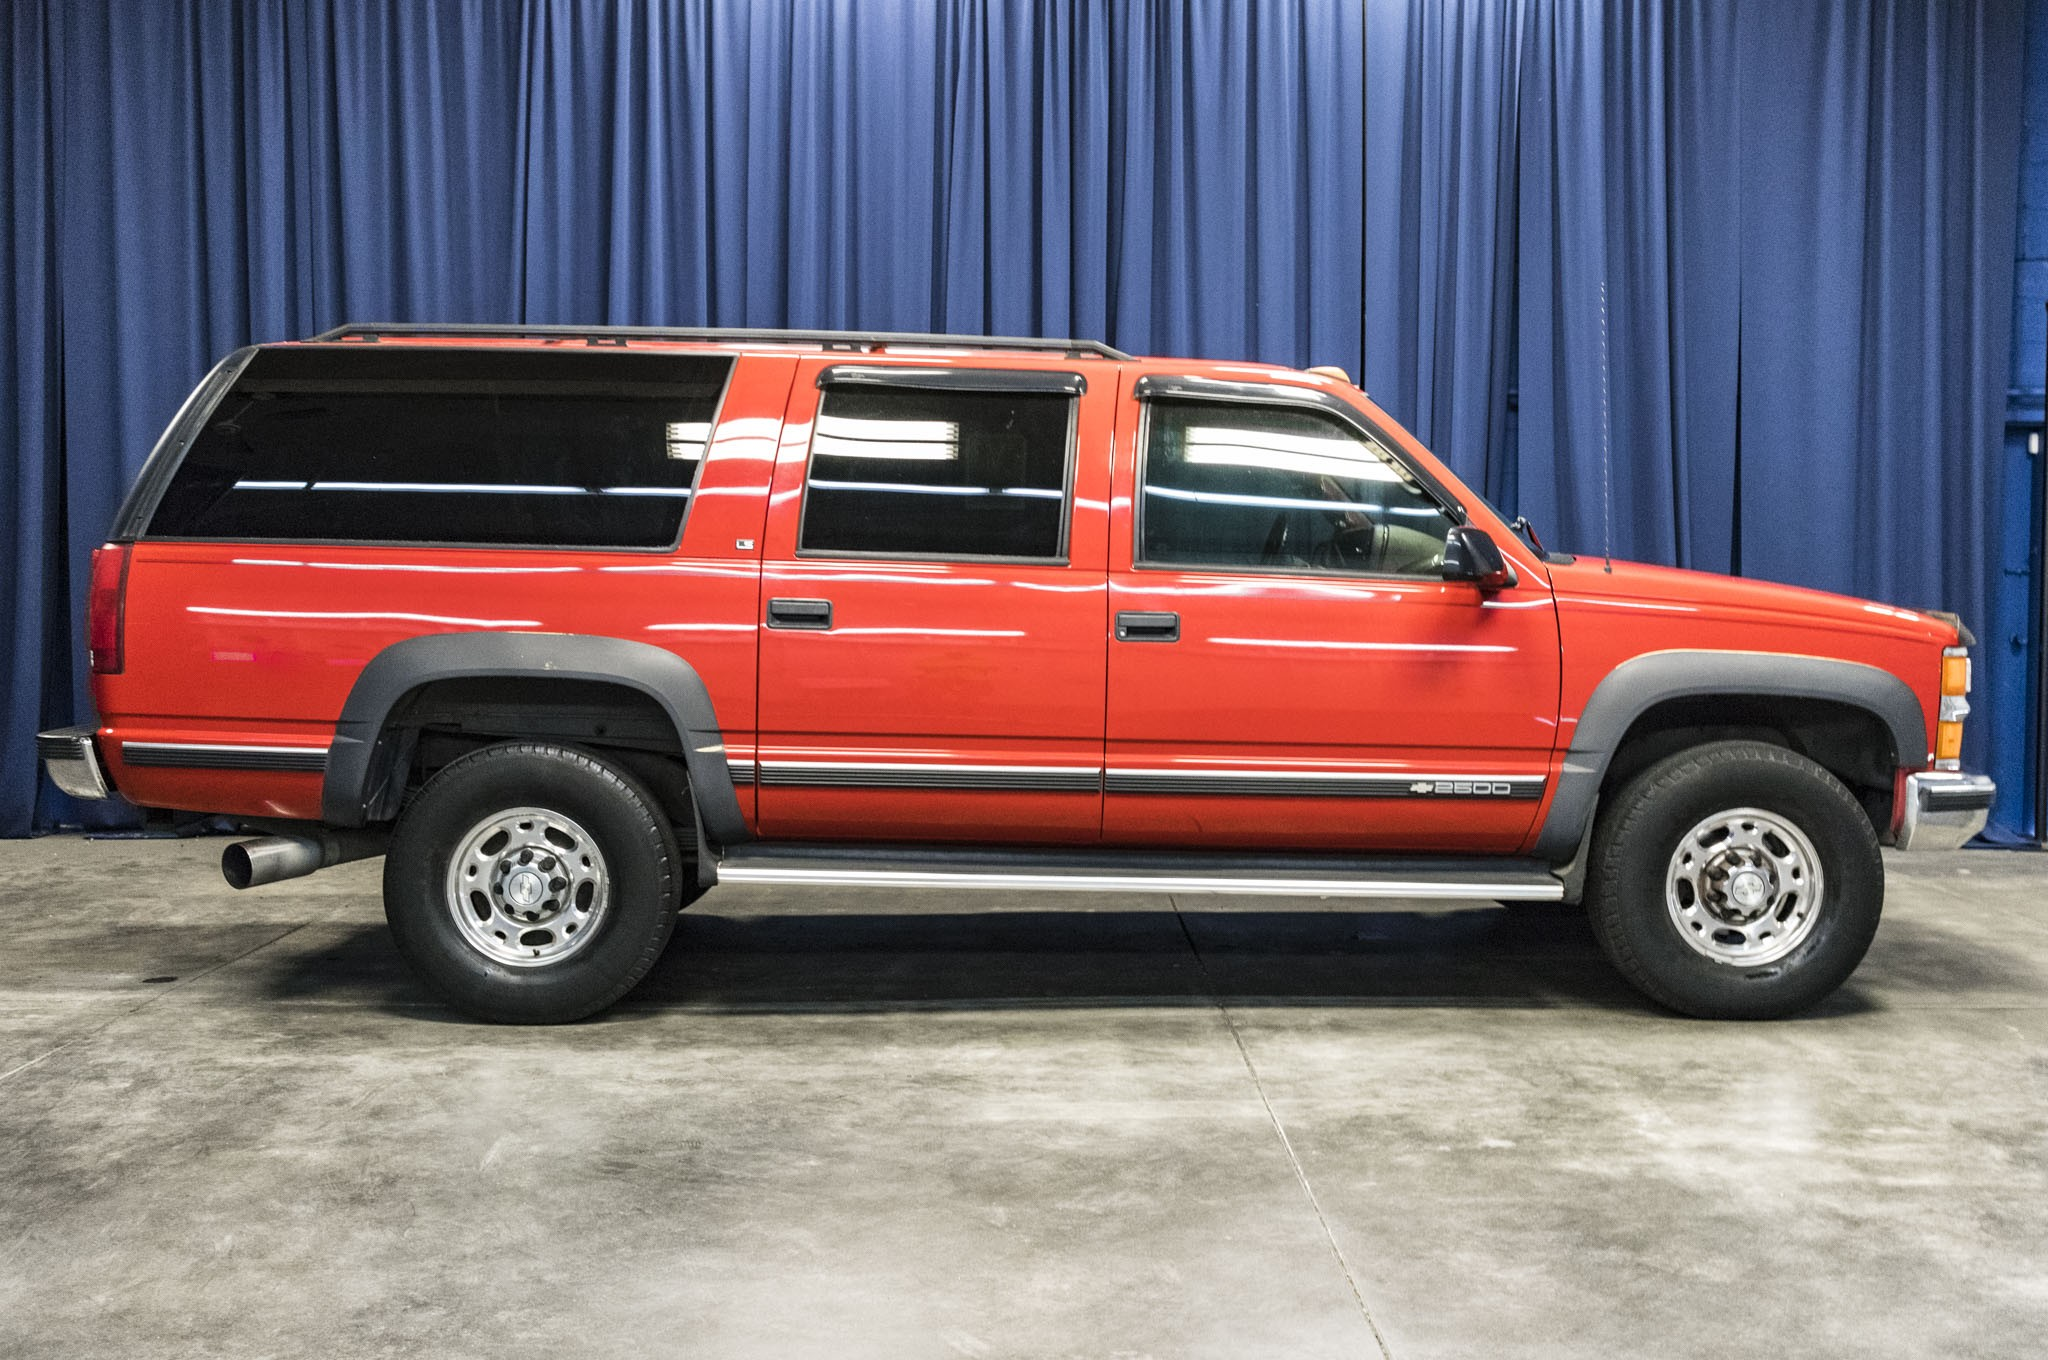 Used 1996 Chevrolet Suburban 2500 Cheyenne 4x4 Diesel SUV For Sale